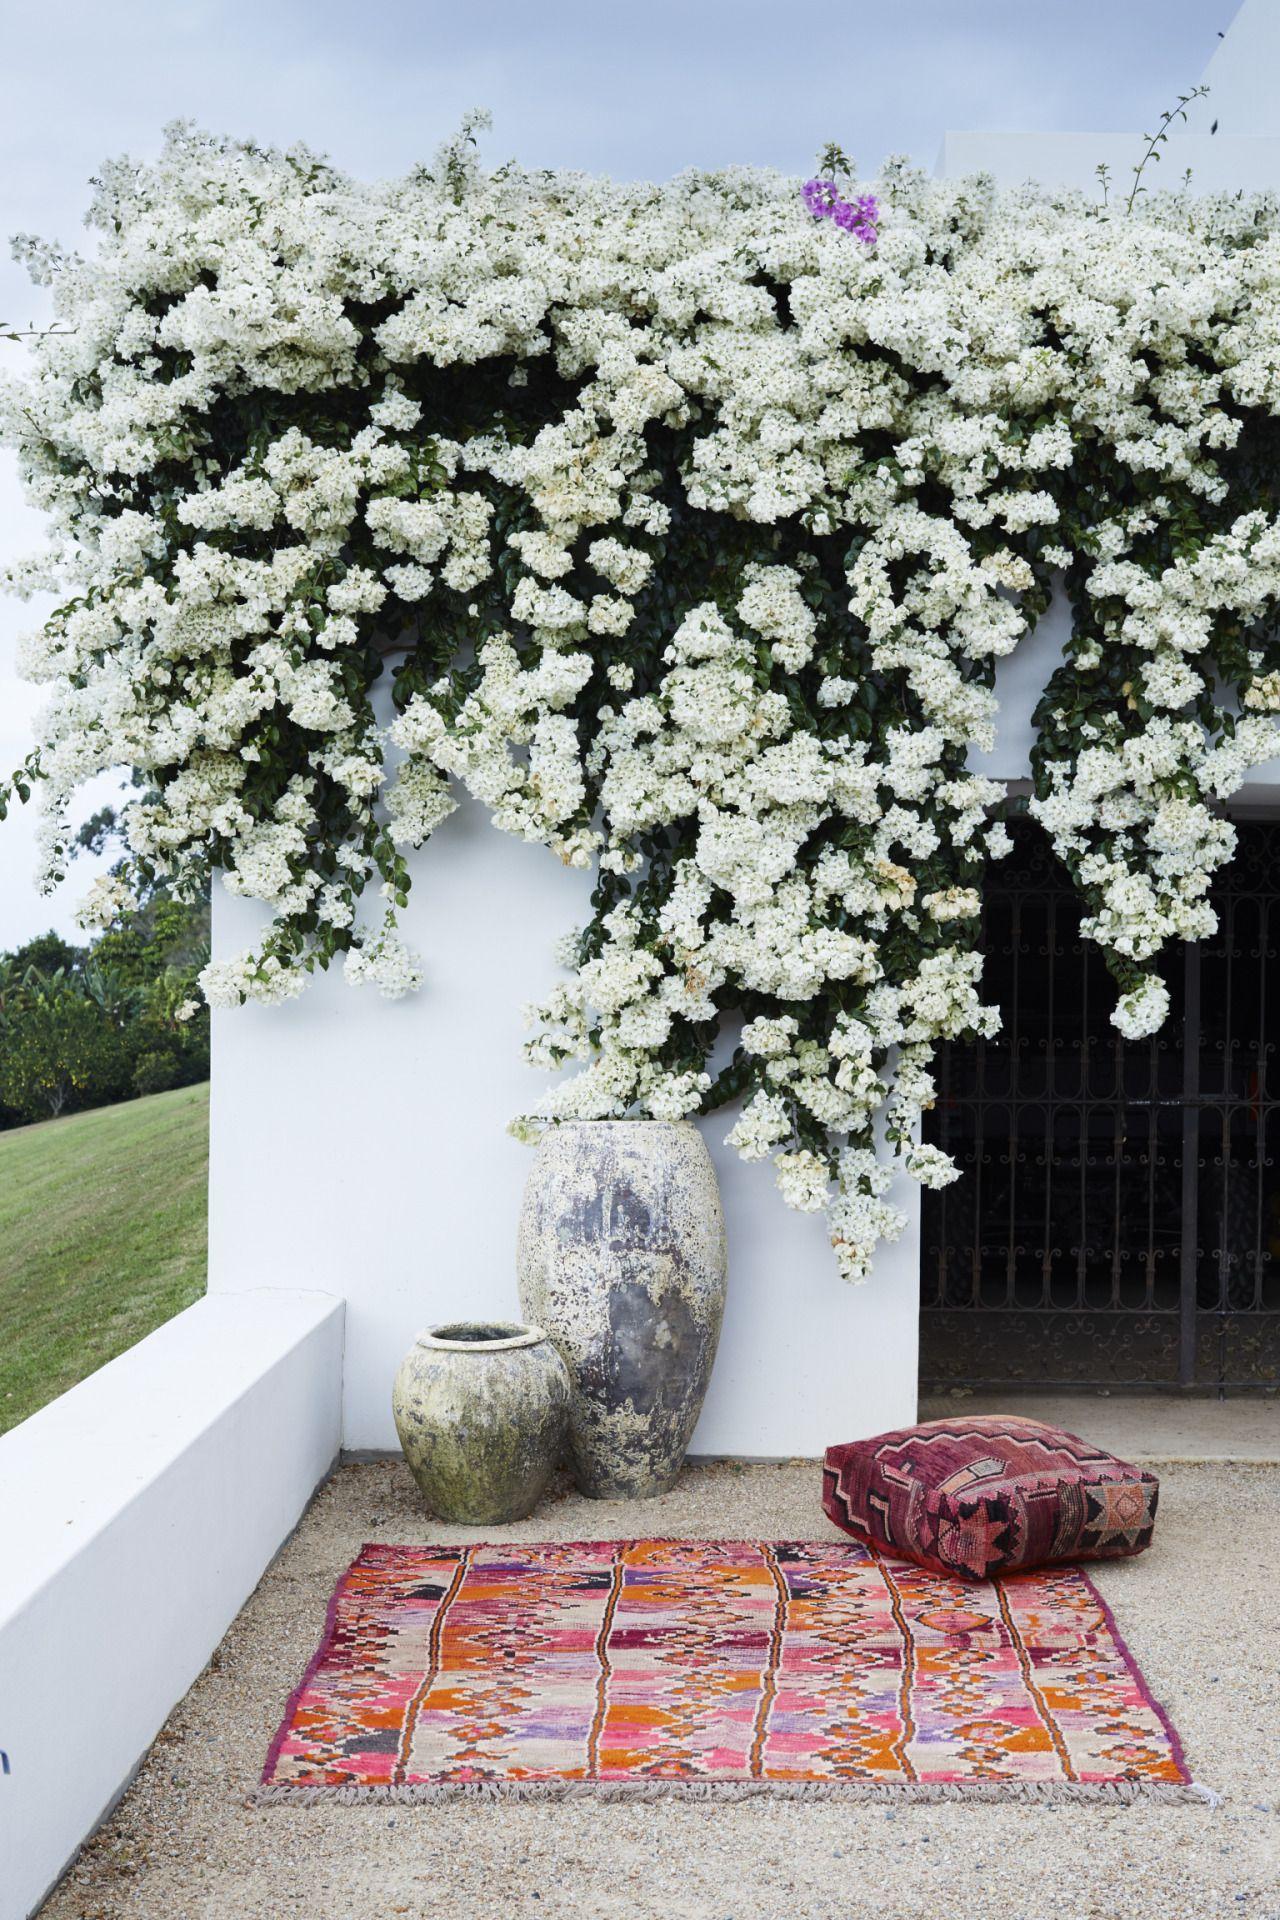 Zambian wedding decorations  paint it beautiful  Buganvilia Verano  Pinterest  Gardens